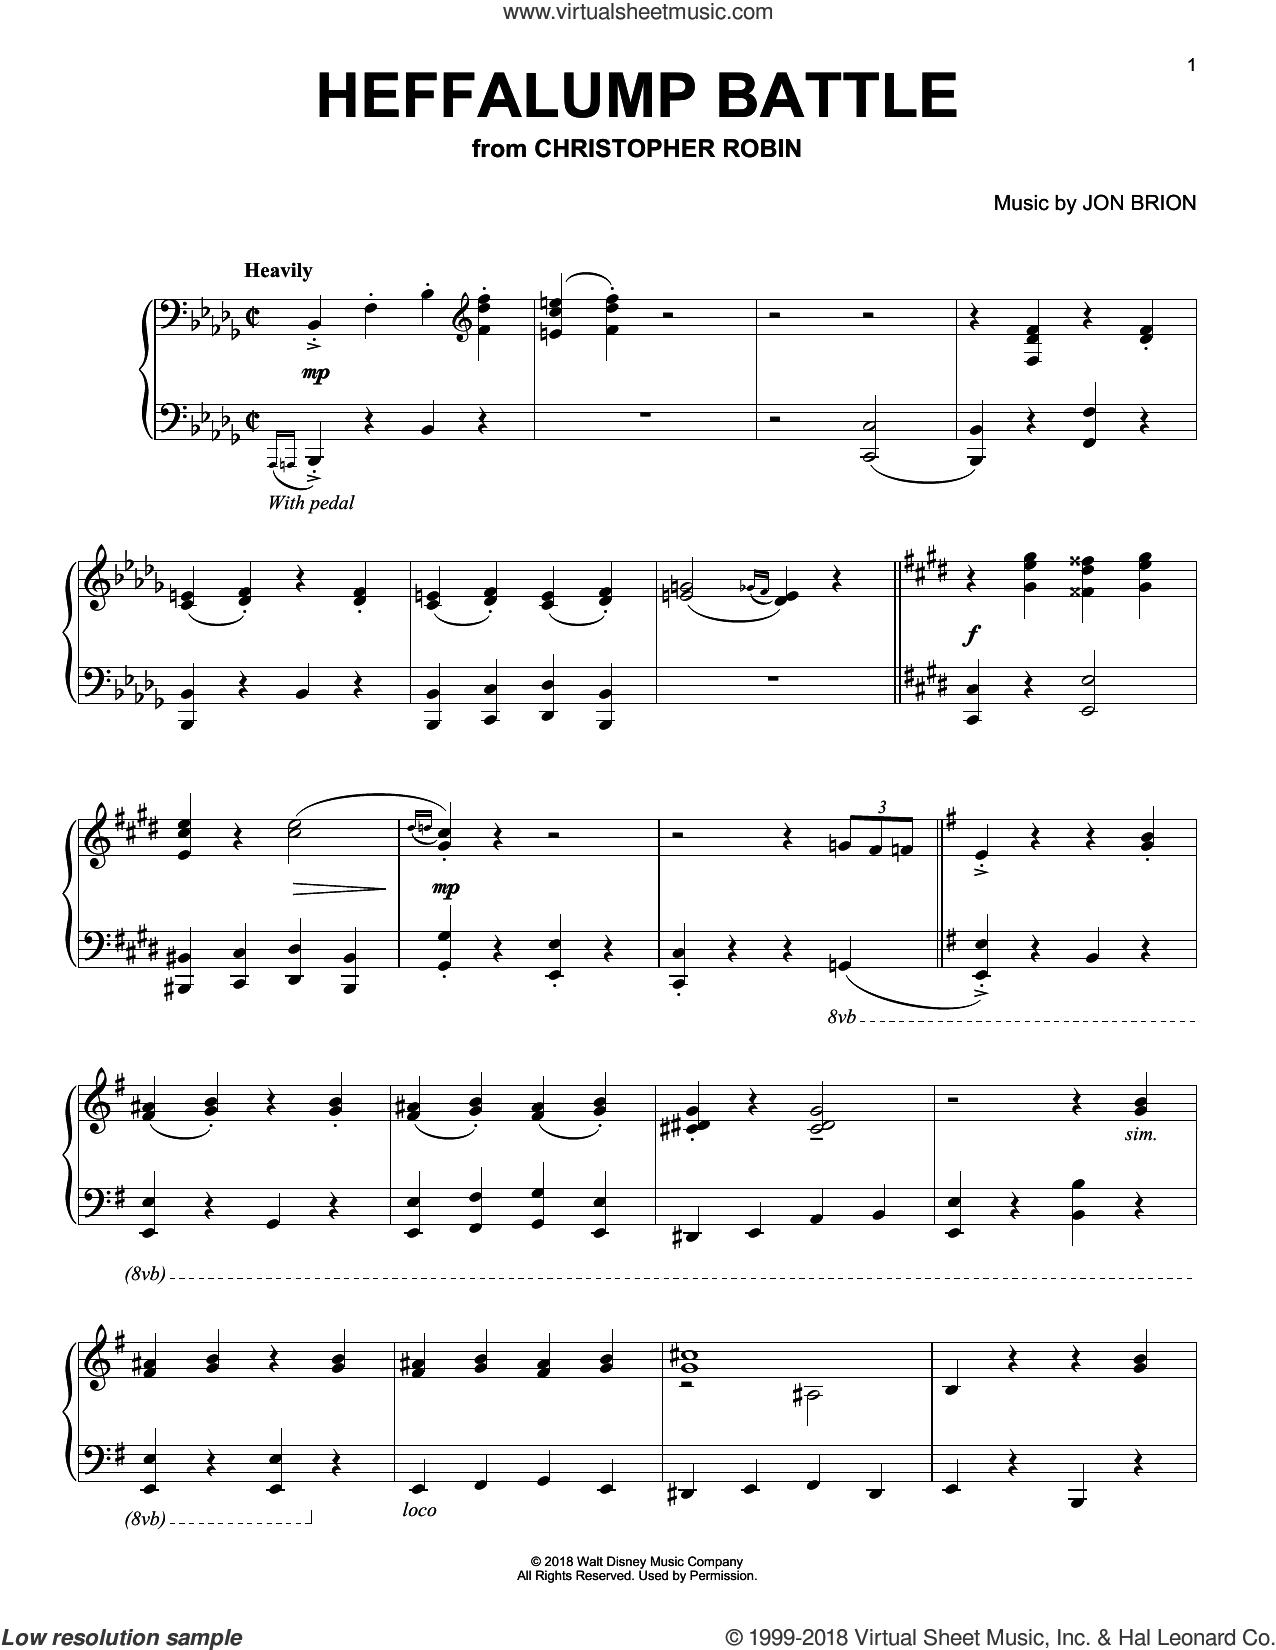 Heffalump Battle (from Christopher Robin) sheet music for piano solo by Geoff Zanelli & Jon Brion, Geoff Zanelli and Jon Brion, intermediate skill level